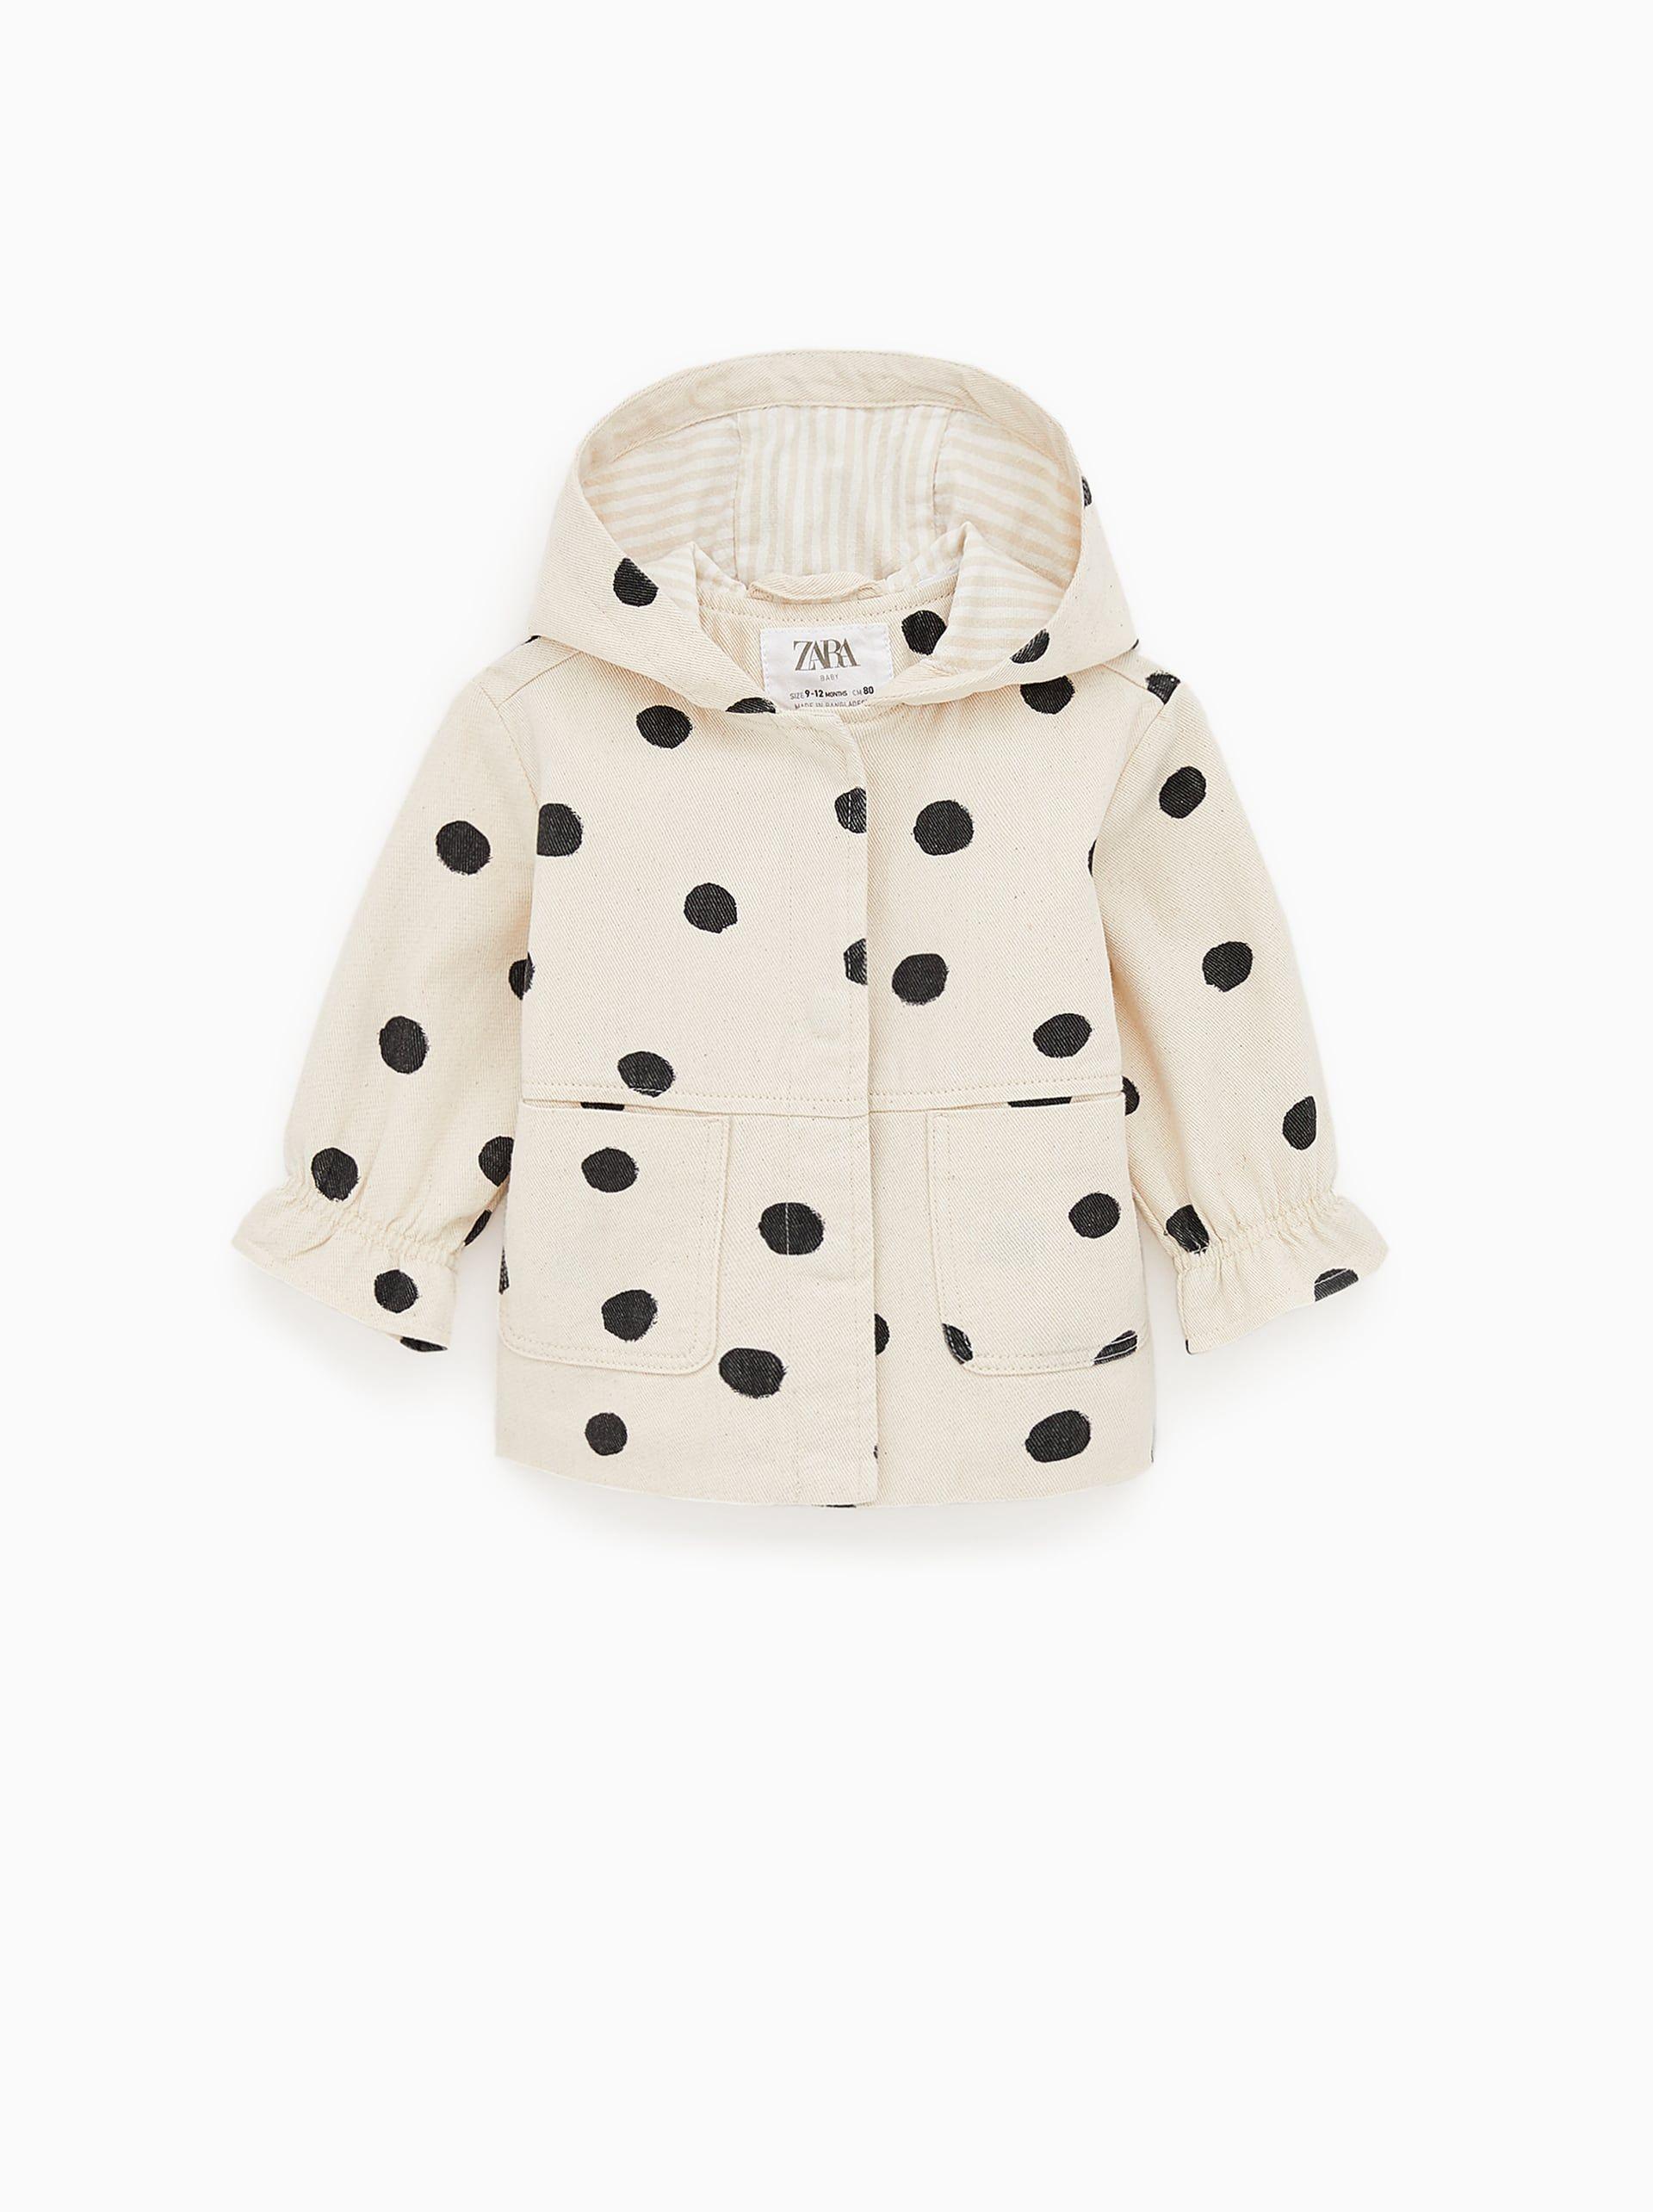 Image 1 Of Polka Dot Jacket From Zara Zara Kinder Jacken Fit